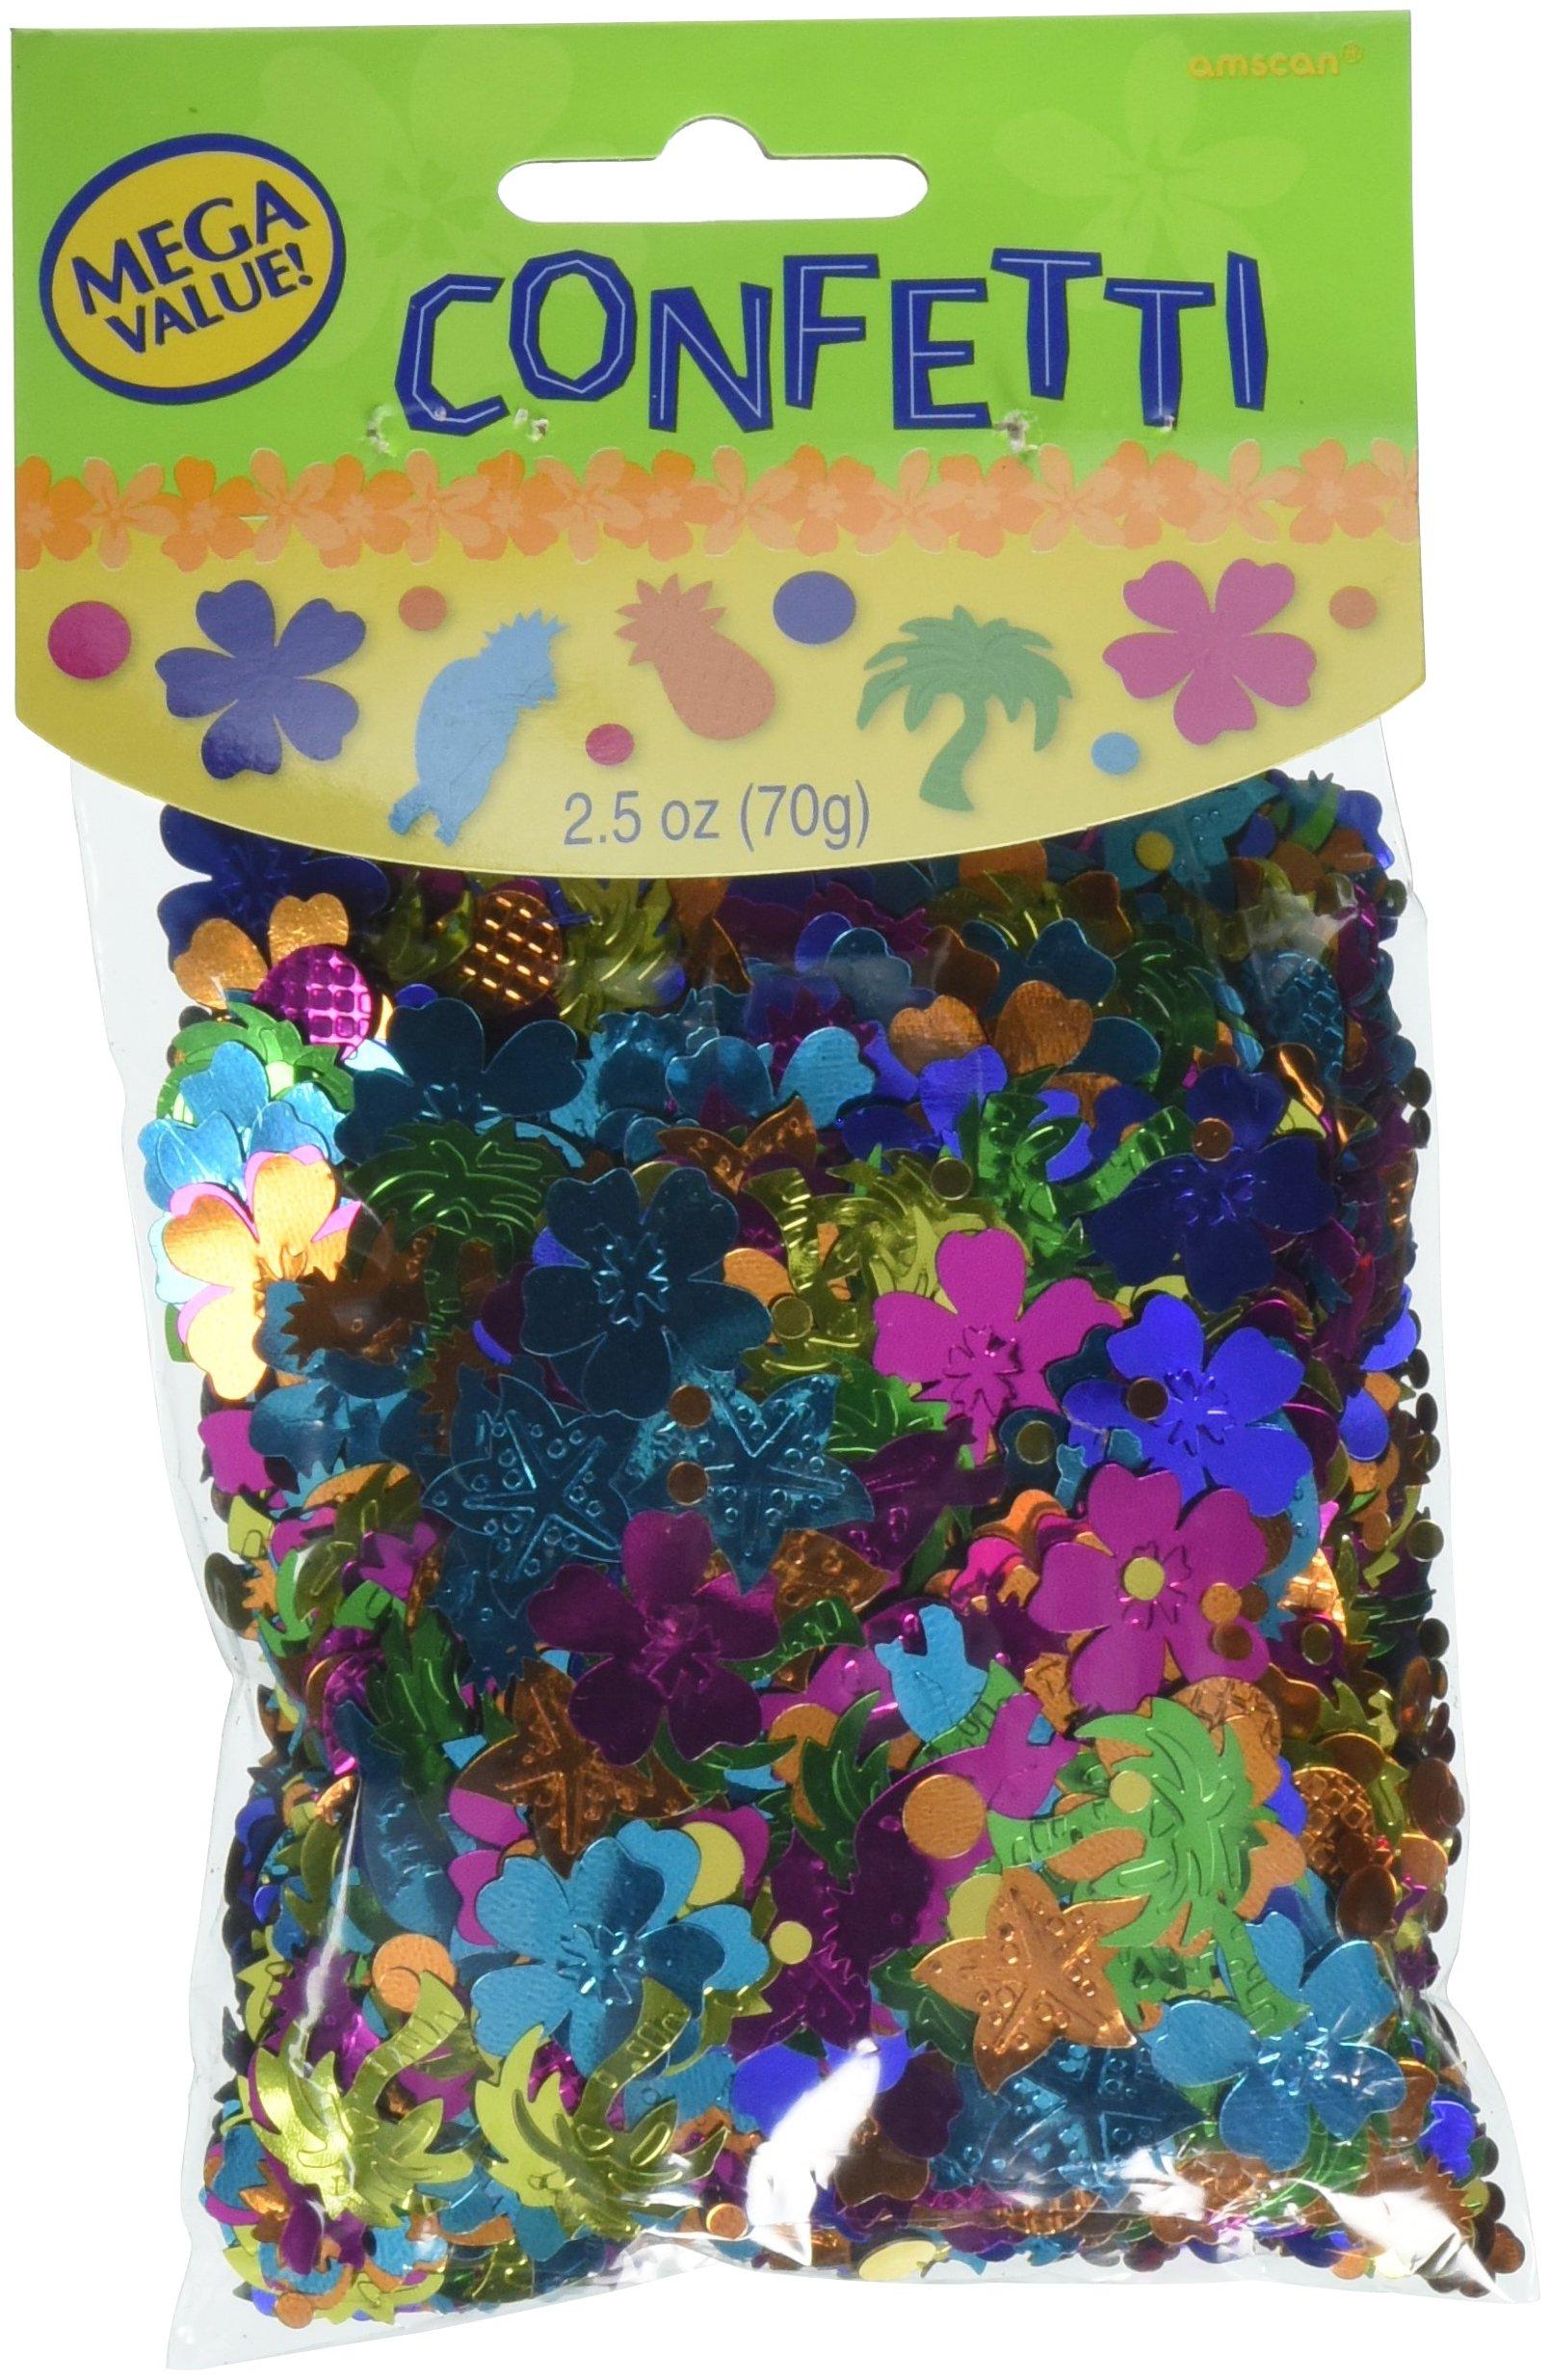 Amscan Tiki Beach Theme Foil Confetti Decoration Mix Party Supplies (12 Piece), Multicolor, 2.5 Oz